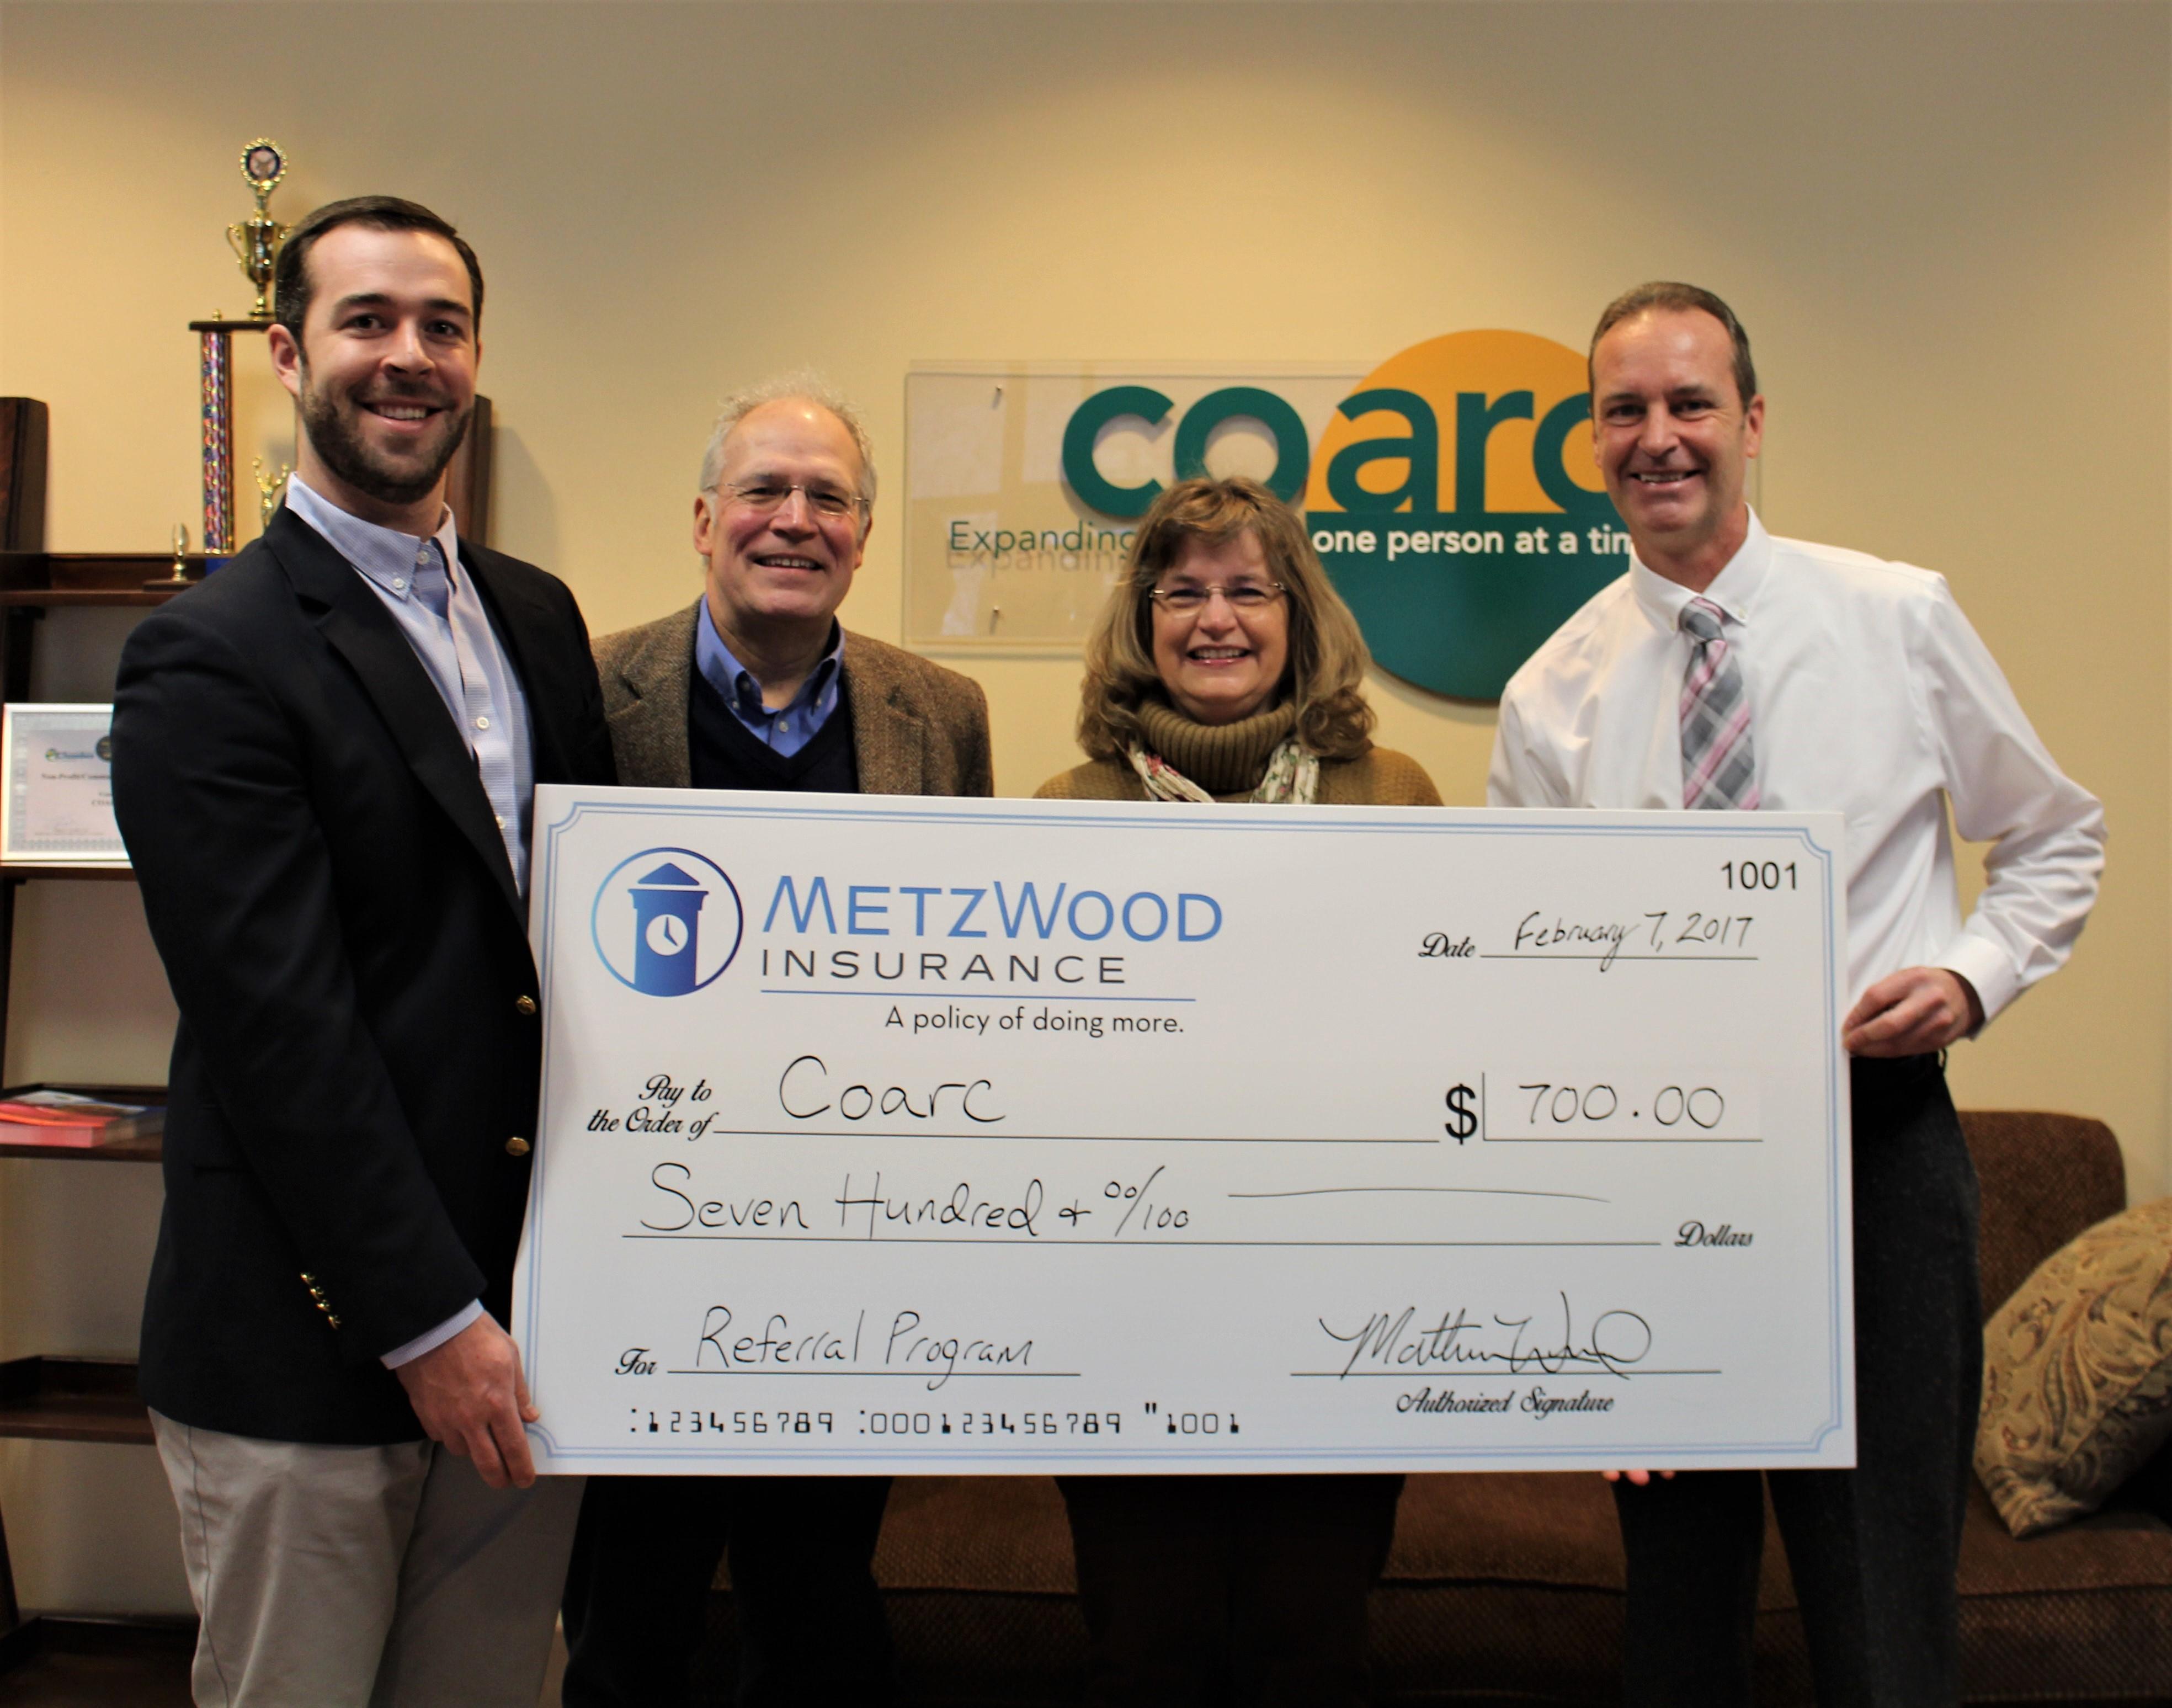 Thank you, MetzWood Insurance!